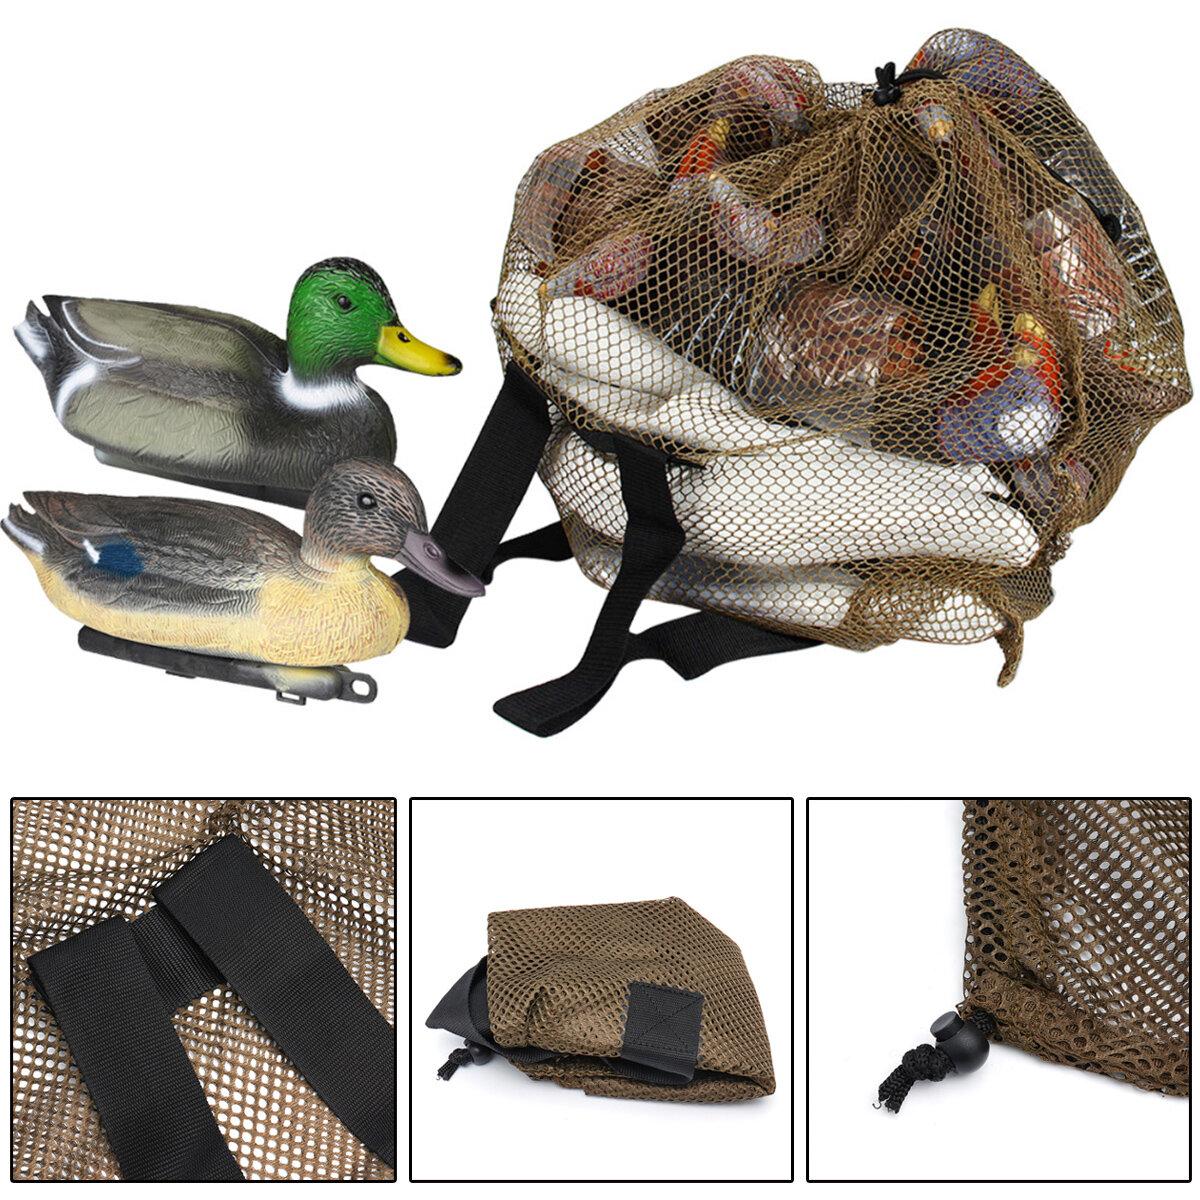 ZANLURE 120x75cm Large Outdoor Duck Decoys Bag Mesh With Shoulder Straps Backpack Decoy Storage Net Bag for Hunting